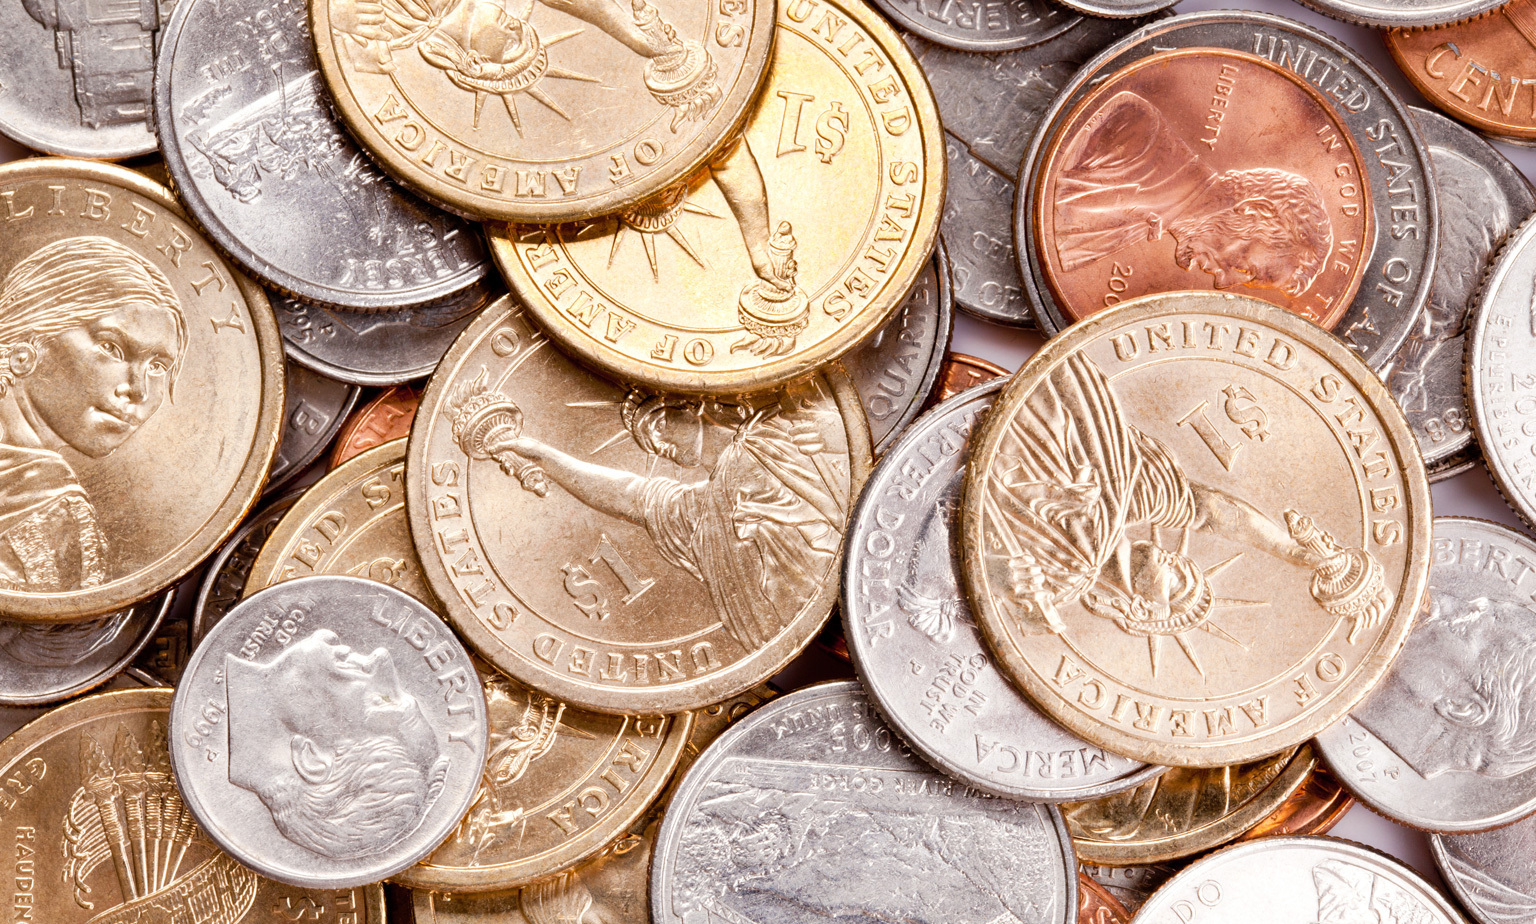 Collectibles Events Antique Sports Memorabilia Coins